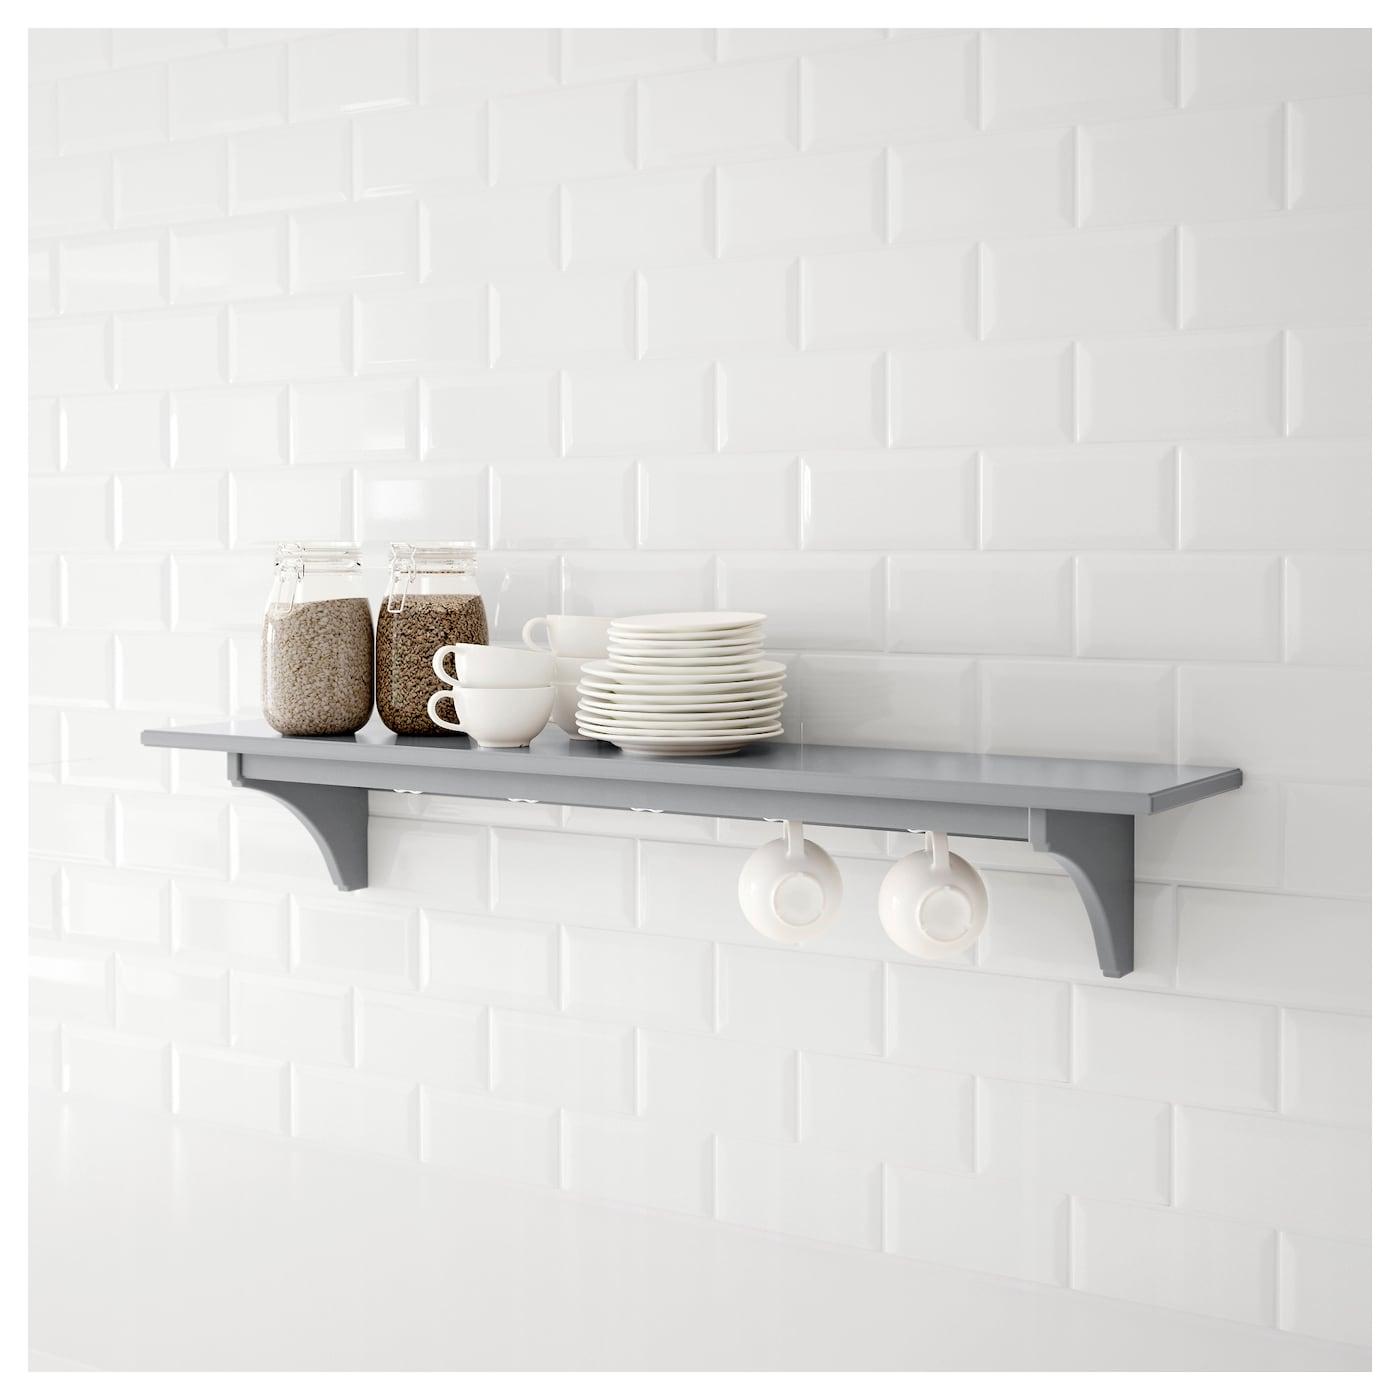 STENSTORP Wall Shelf Grey 120 Cm